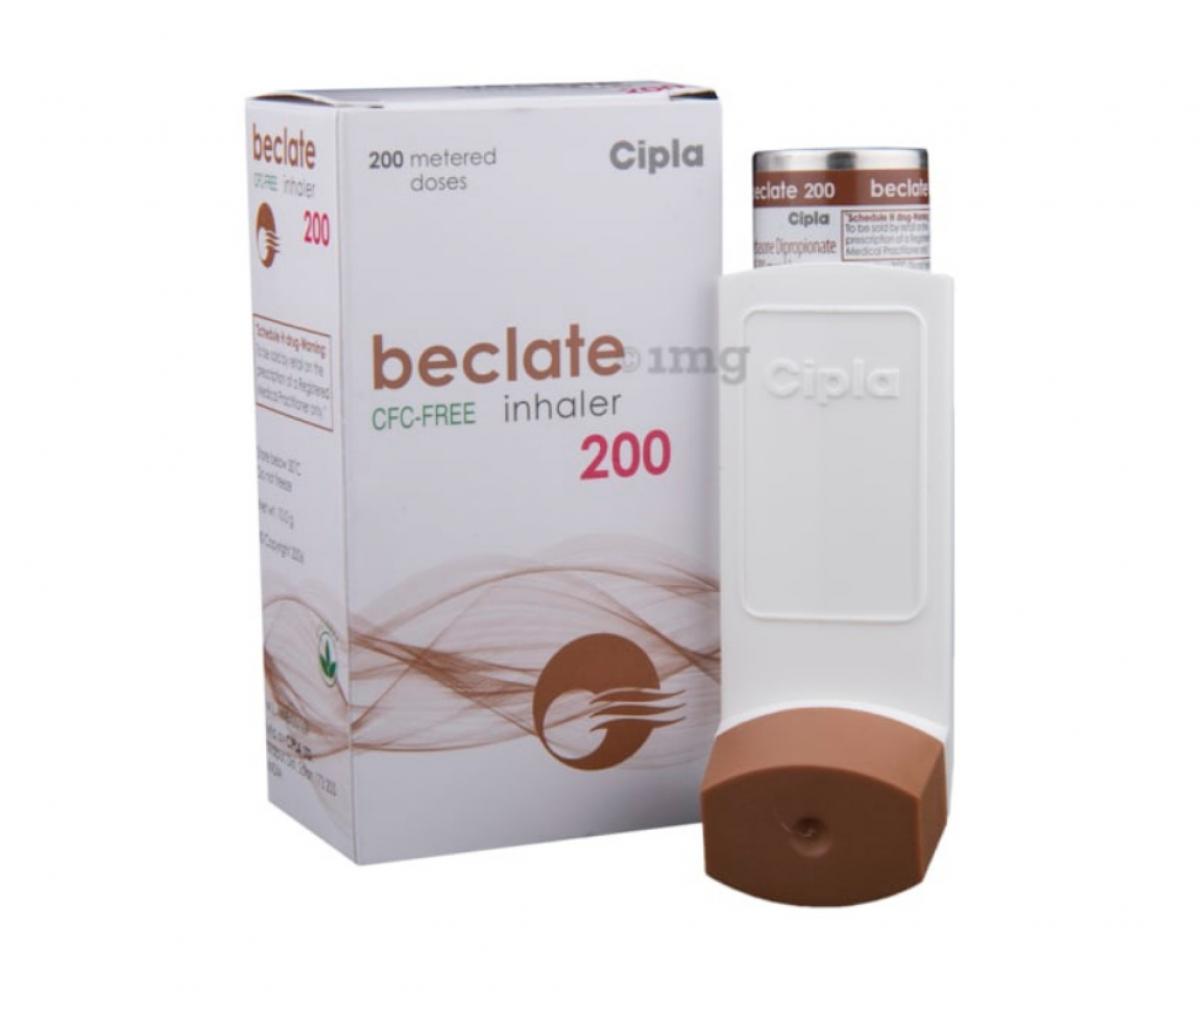 Beclate 200mcg Aerosol Inhaler